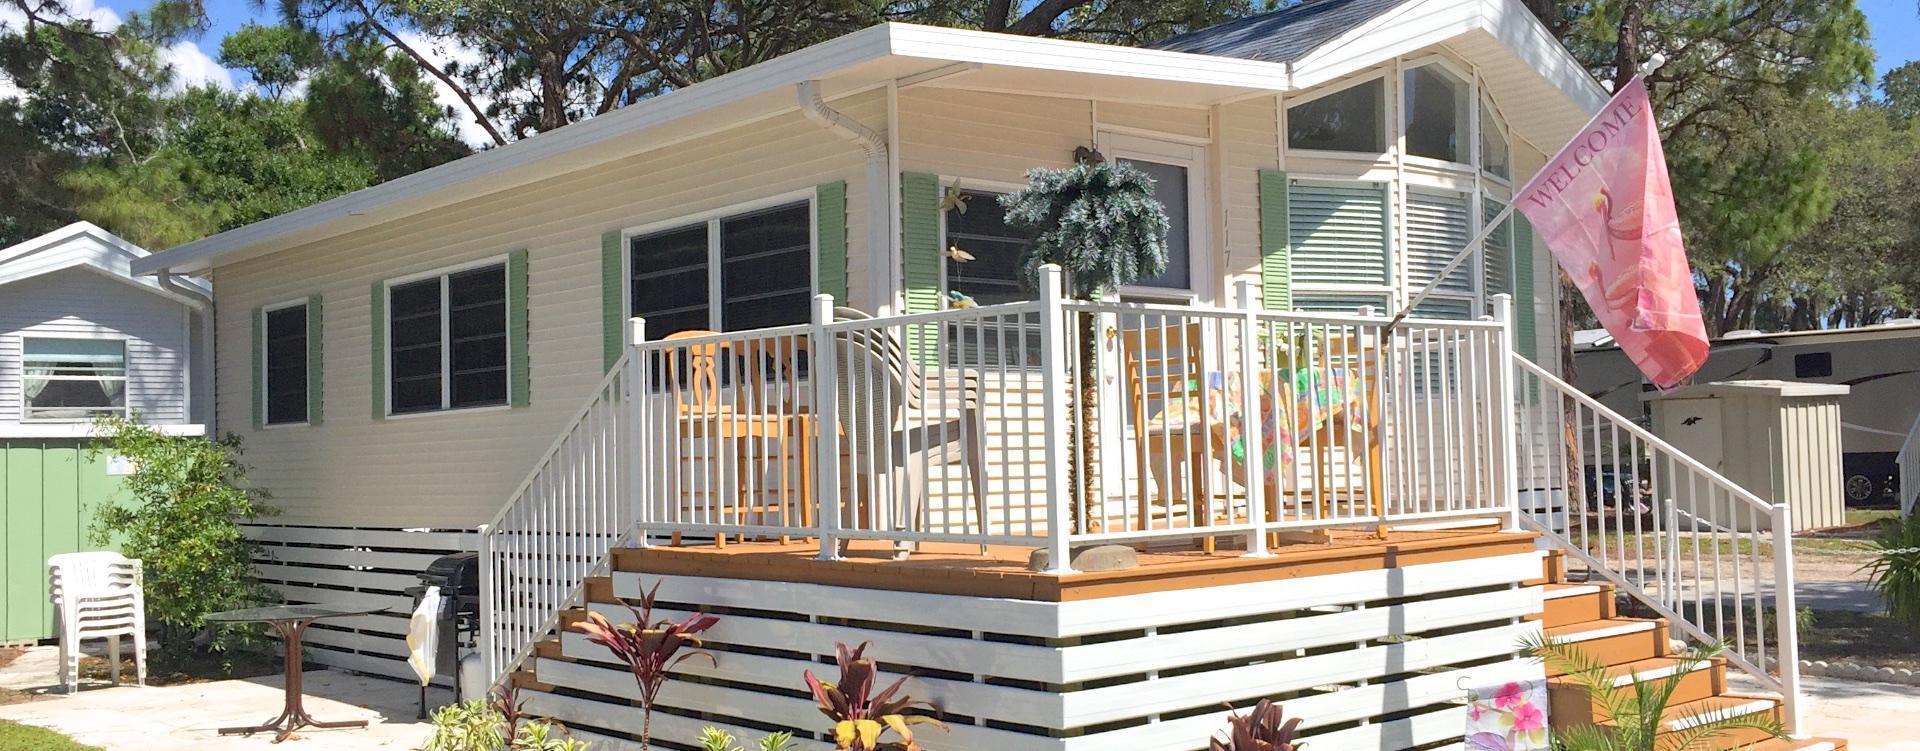 mobile home for sale dunedin fl dunedin rv resort 117